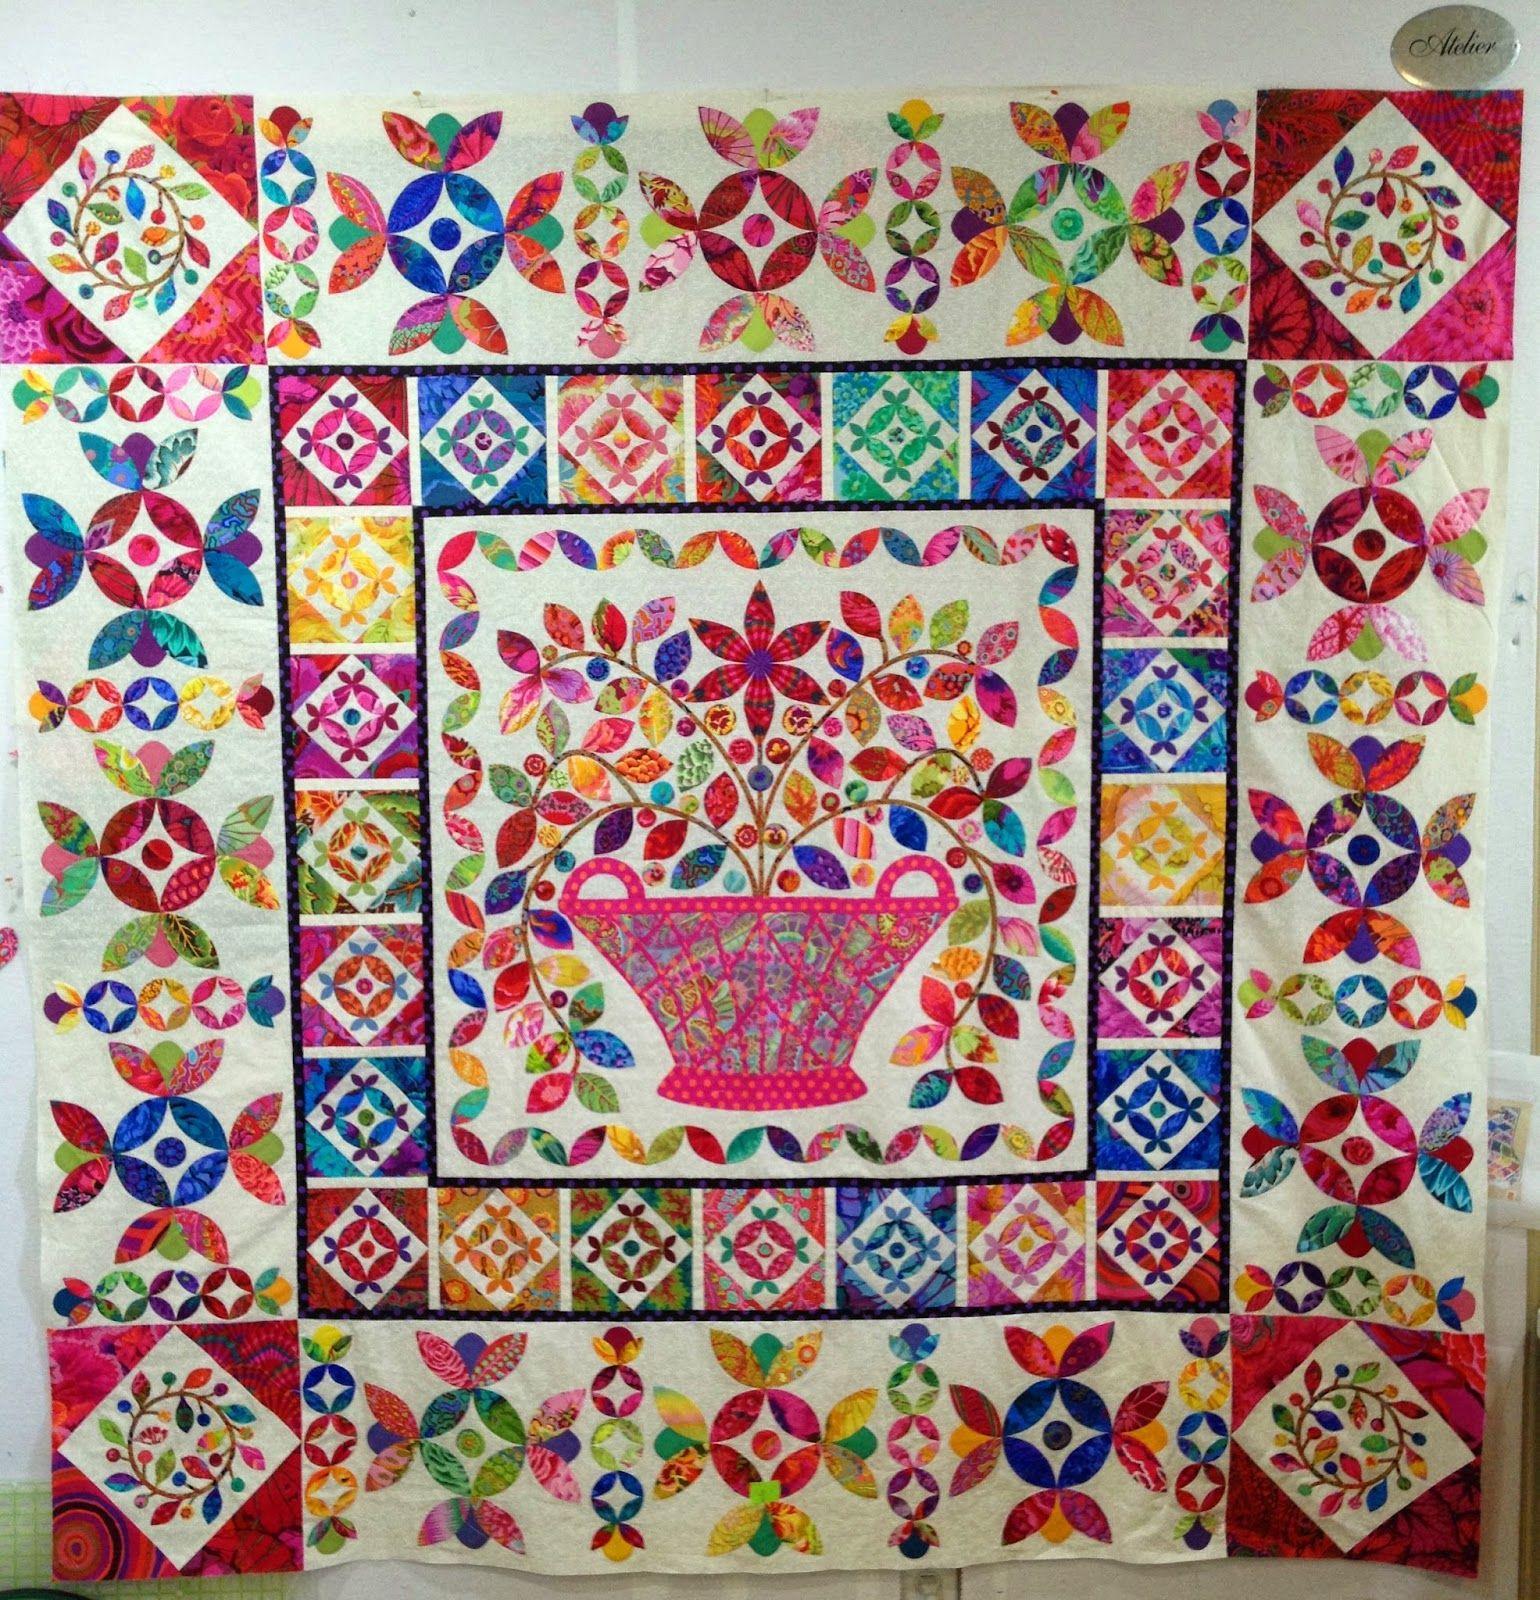 Kim McLean i Danmark | Quilts | Pinterest | Medallion quilt ... : kim mclean quilts - Adamdwight.com